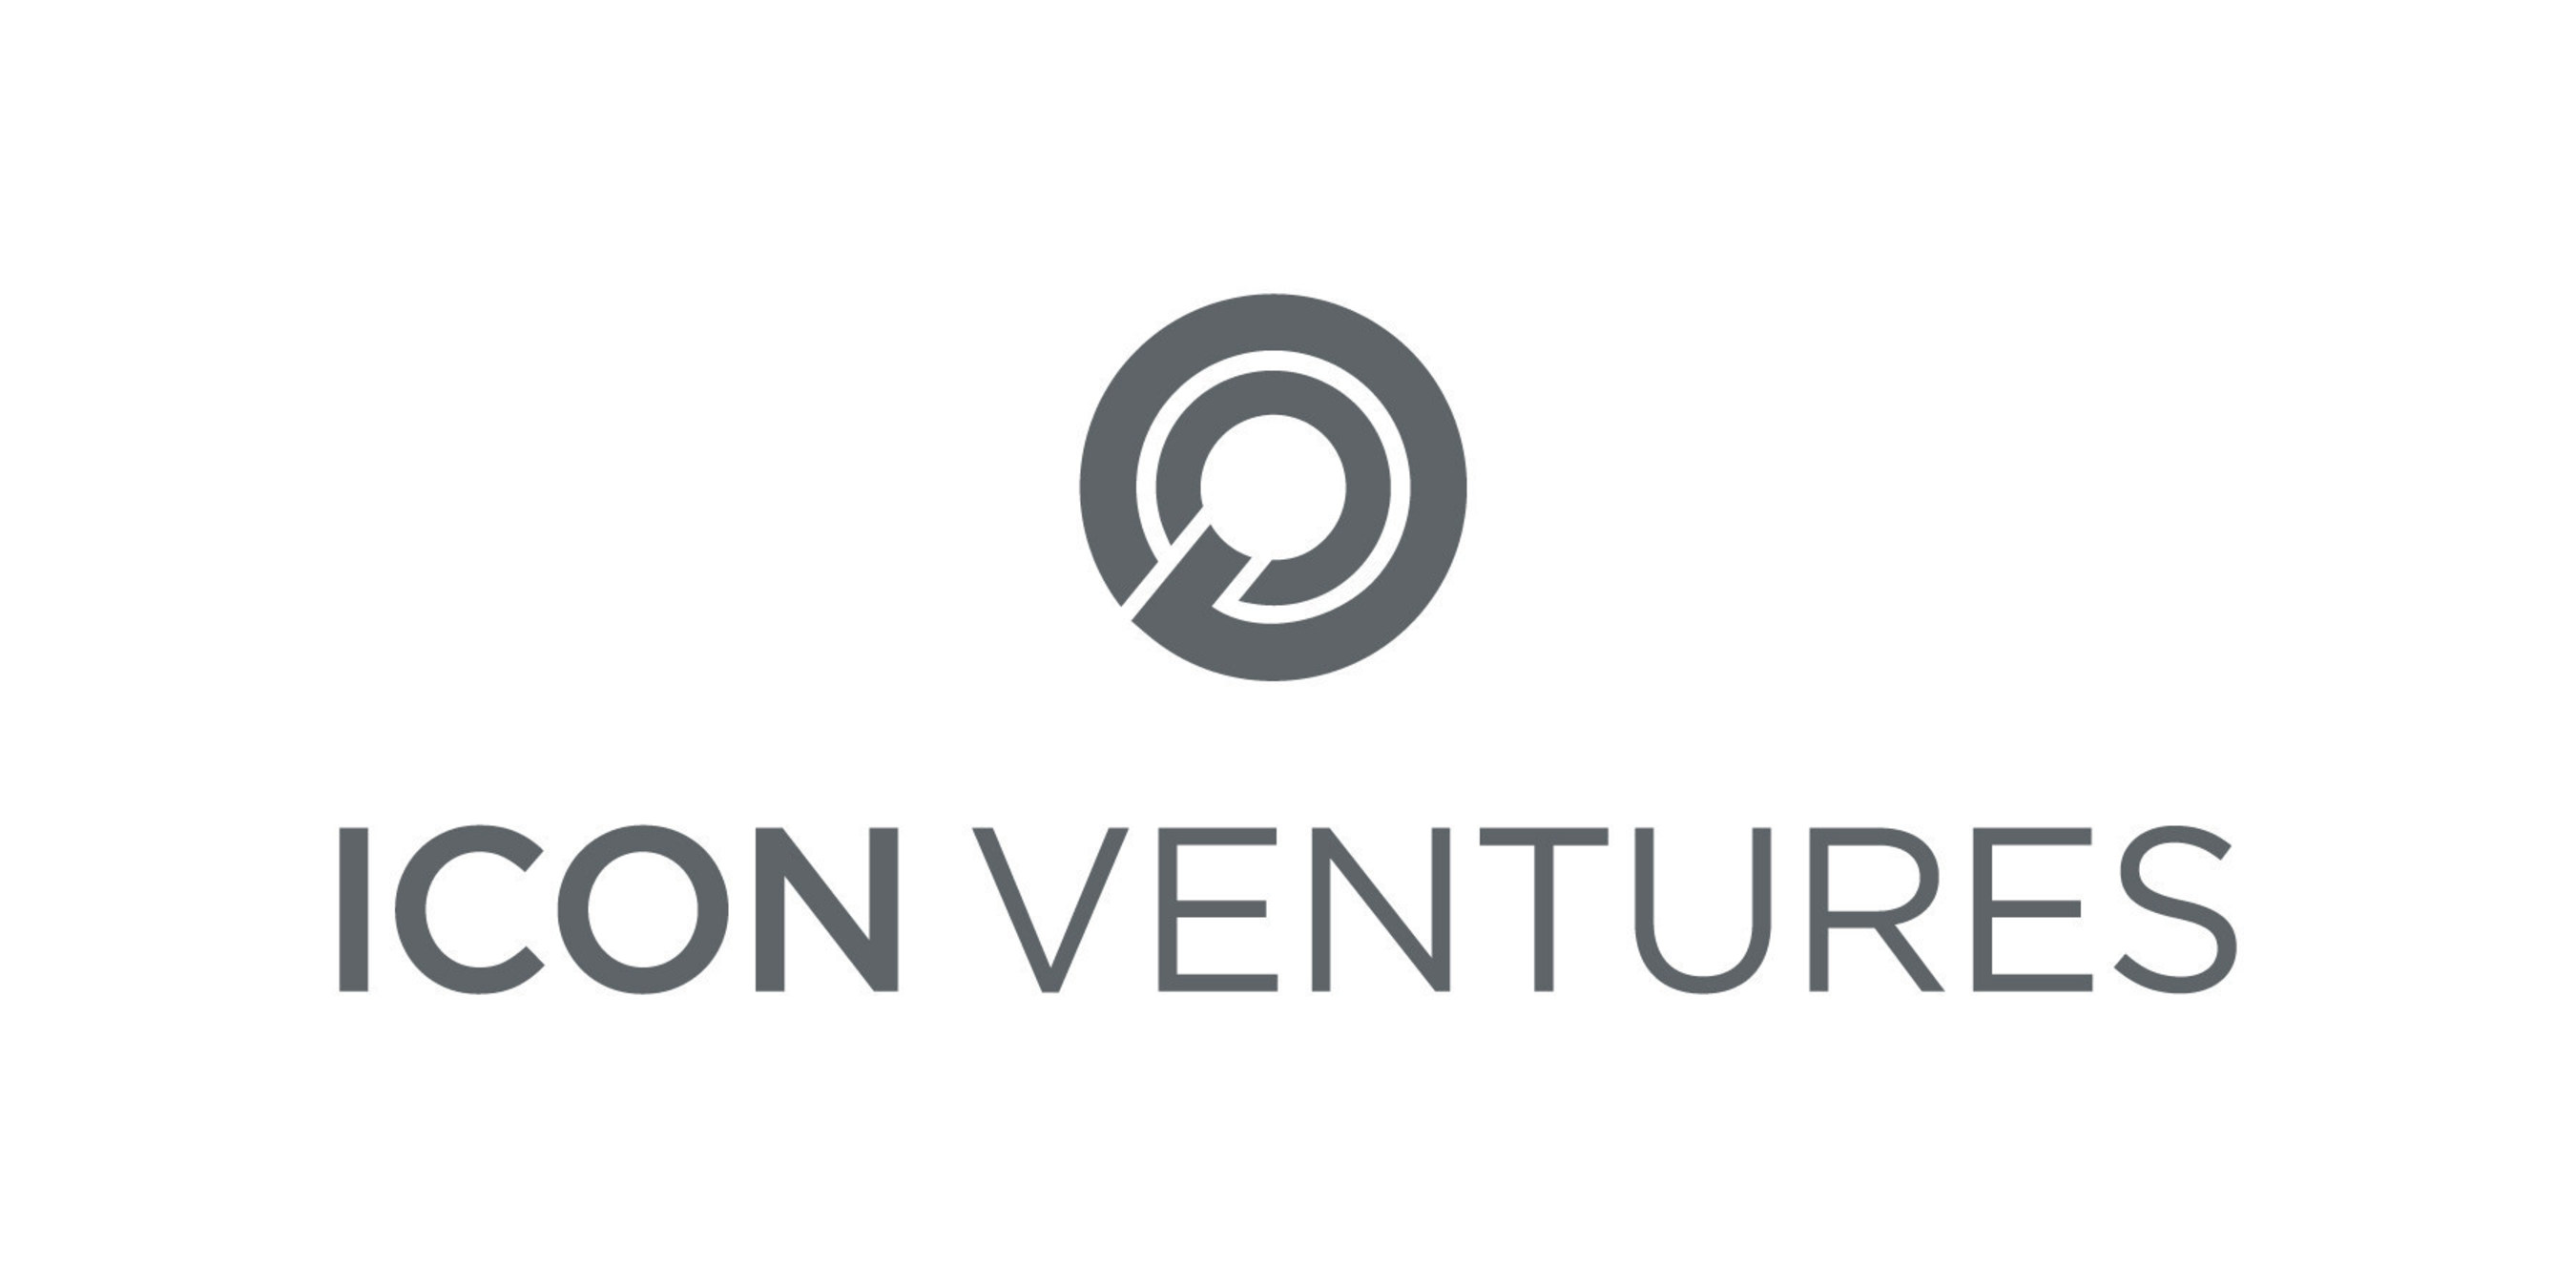 jafco ventures rebrands to icon ventures adds new venture partner new icon ventures logo